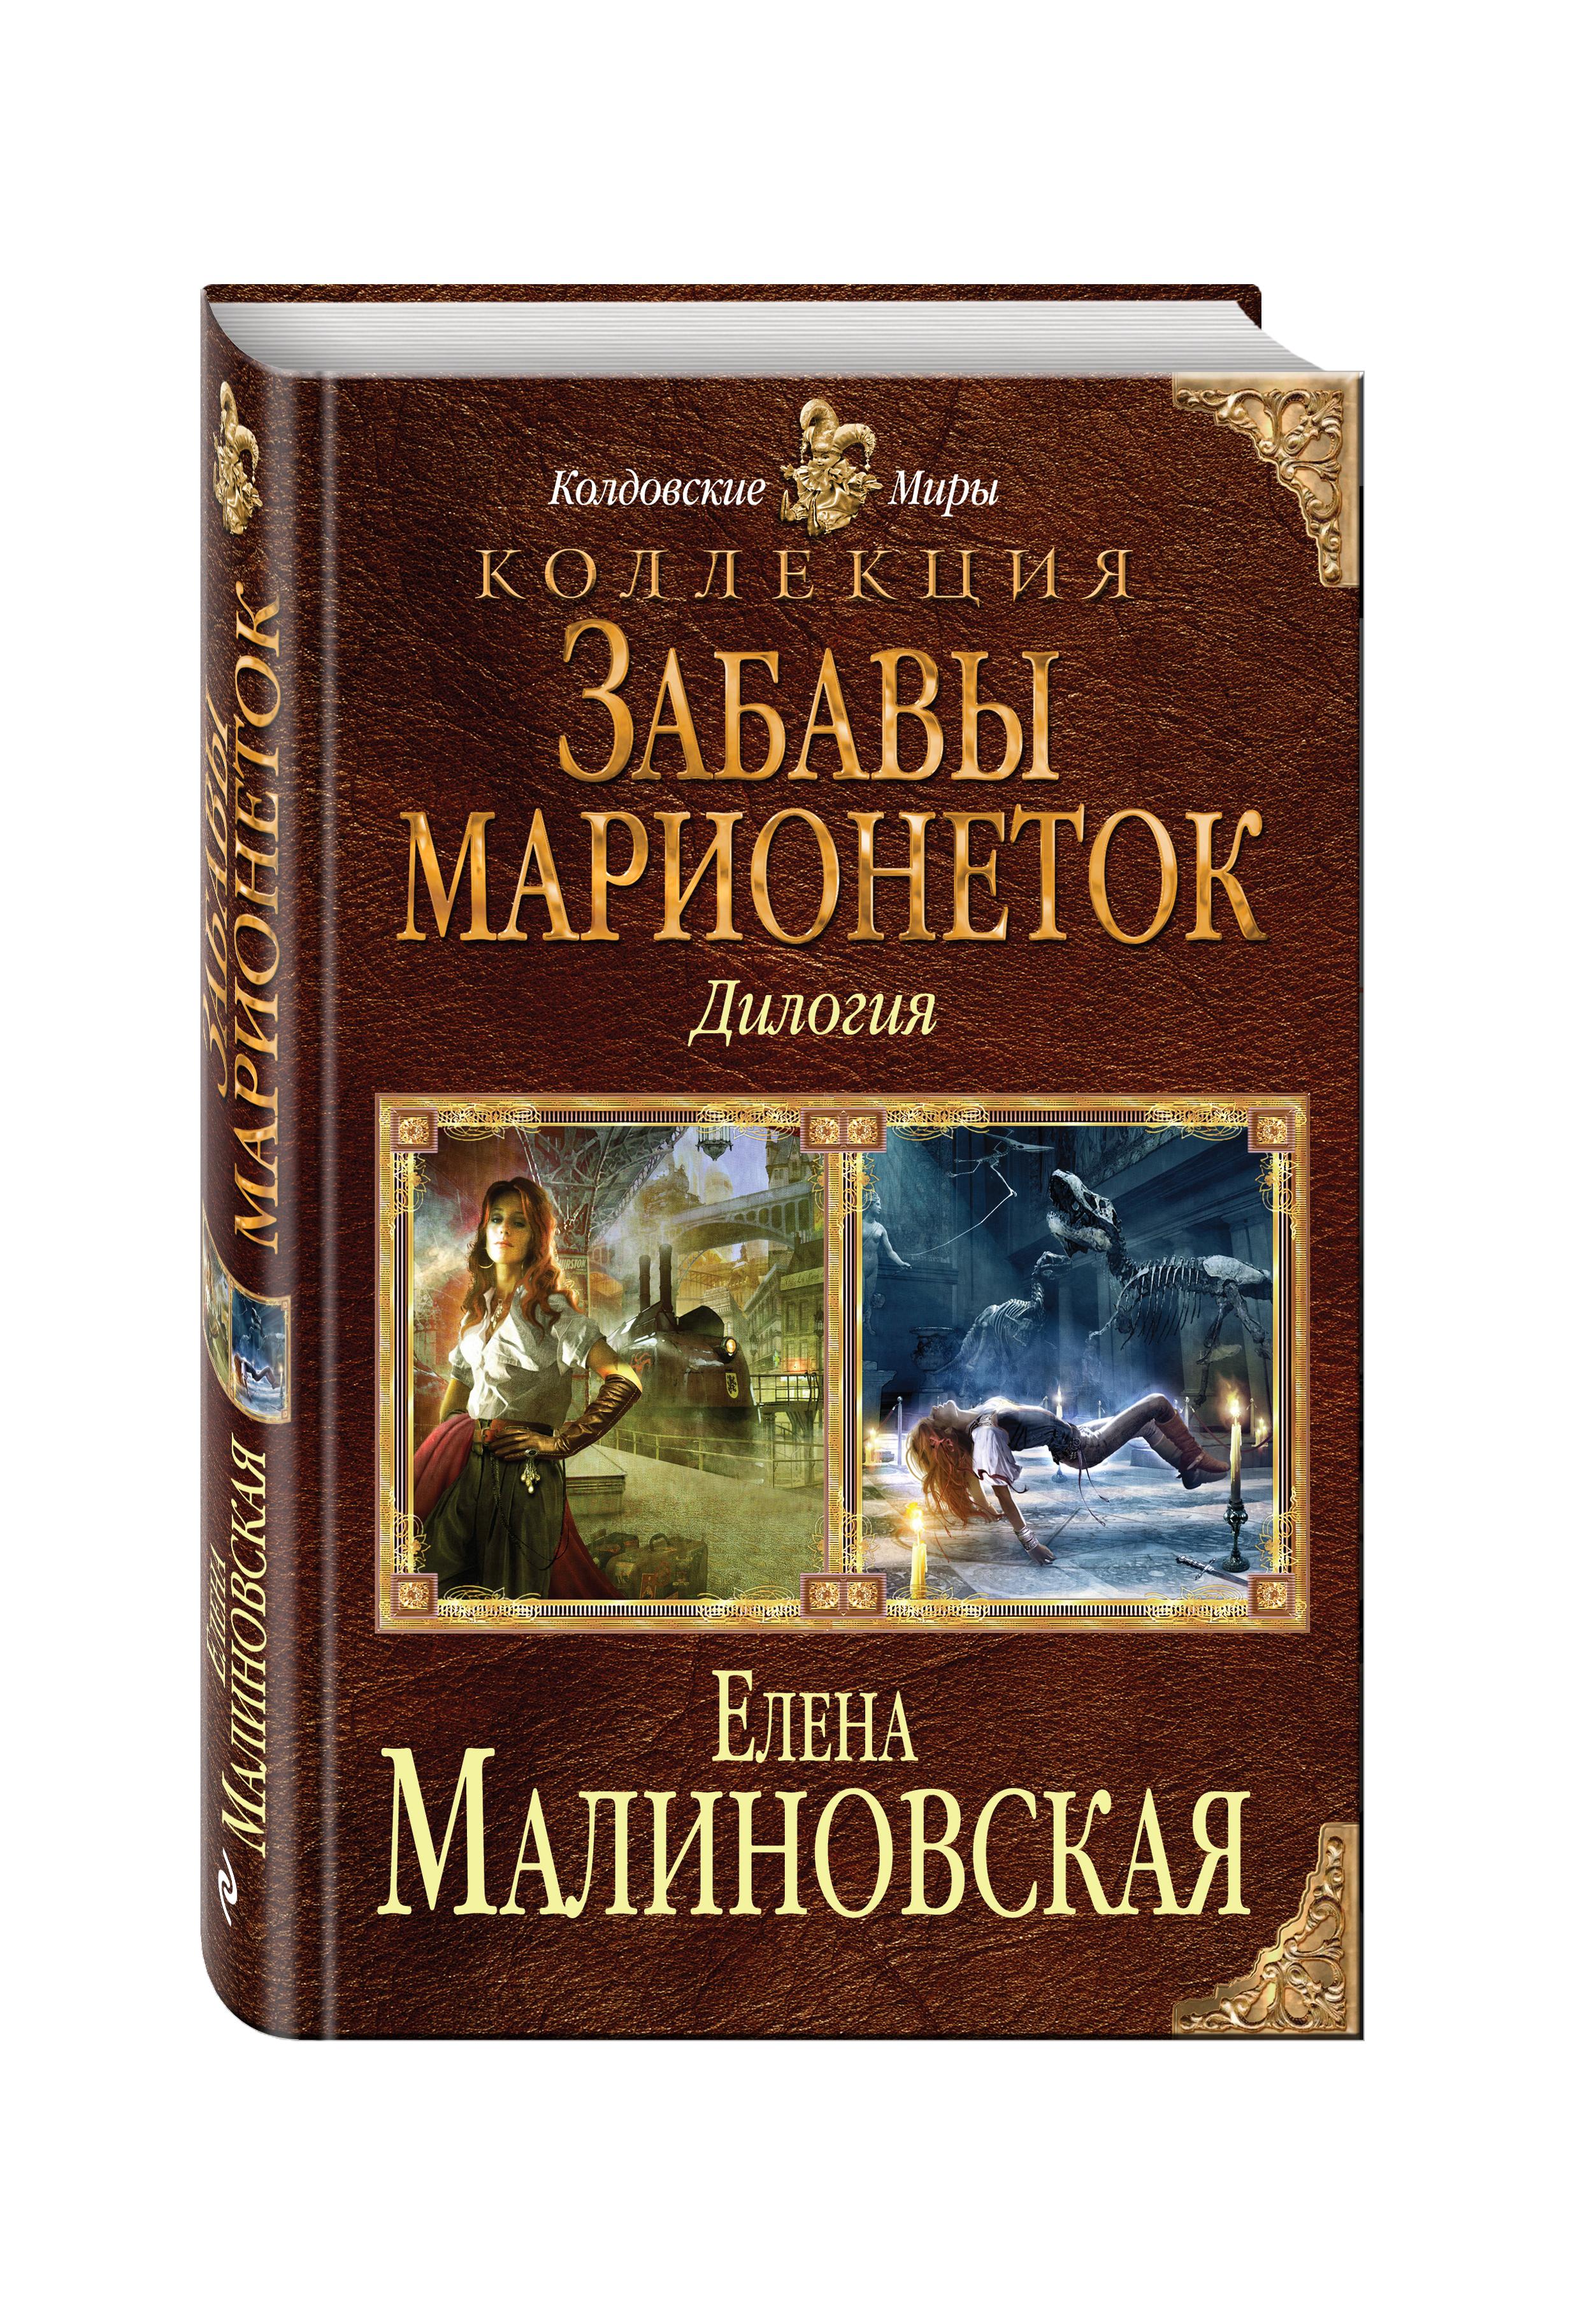 Малиновская Е.М. Забавы марионеток я сбил целый авиаполк мемуары финского аса